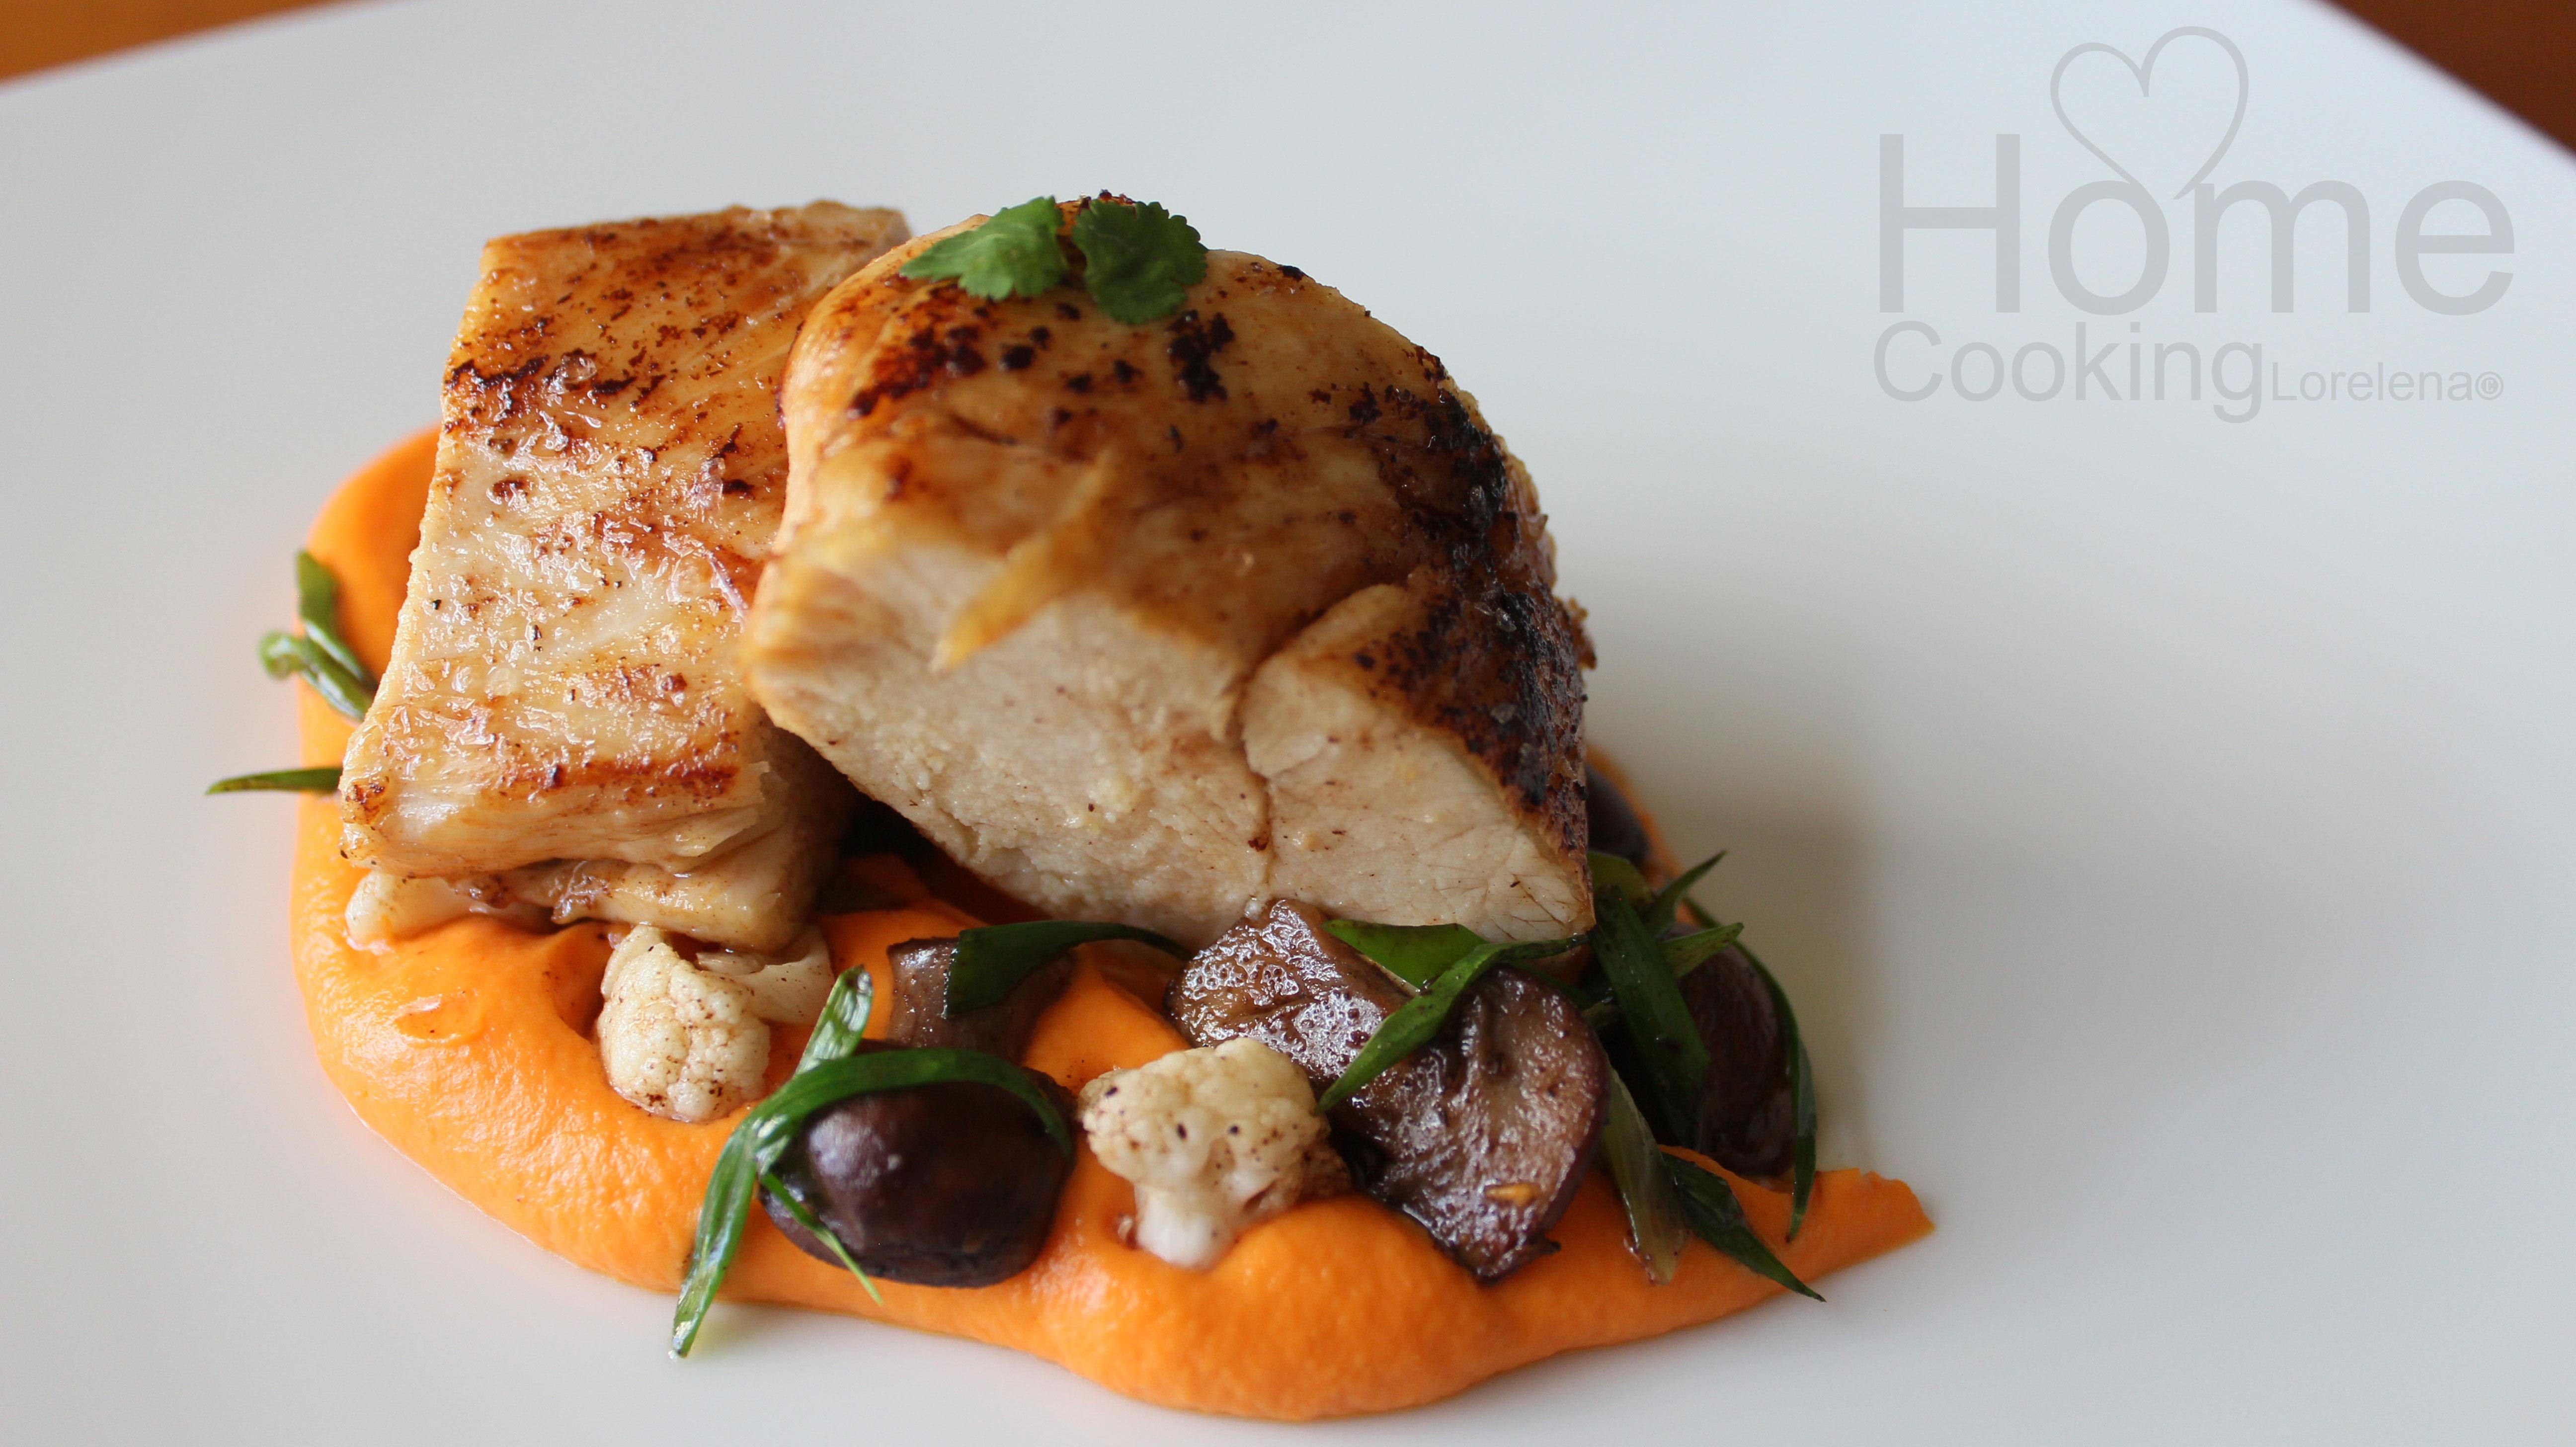 Fried chicken breast recipes uk